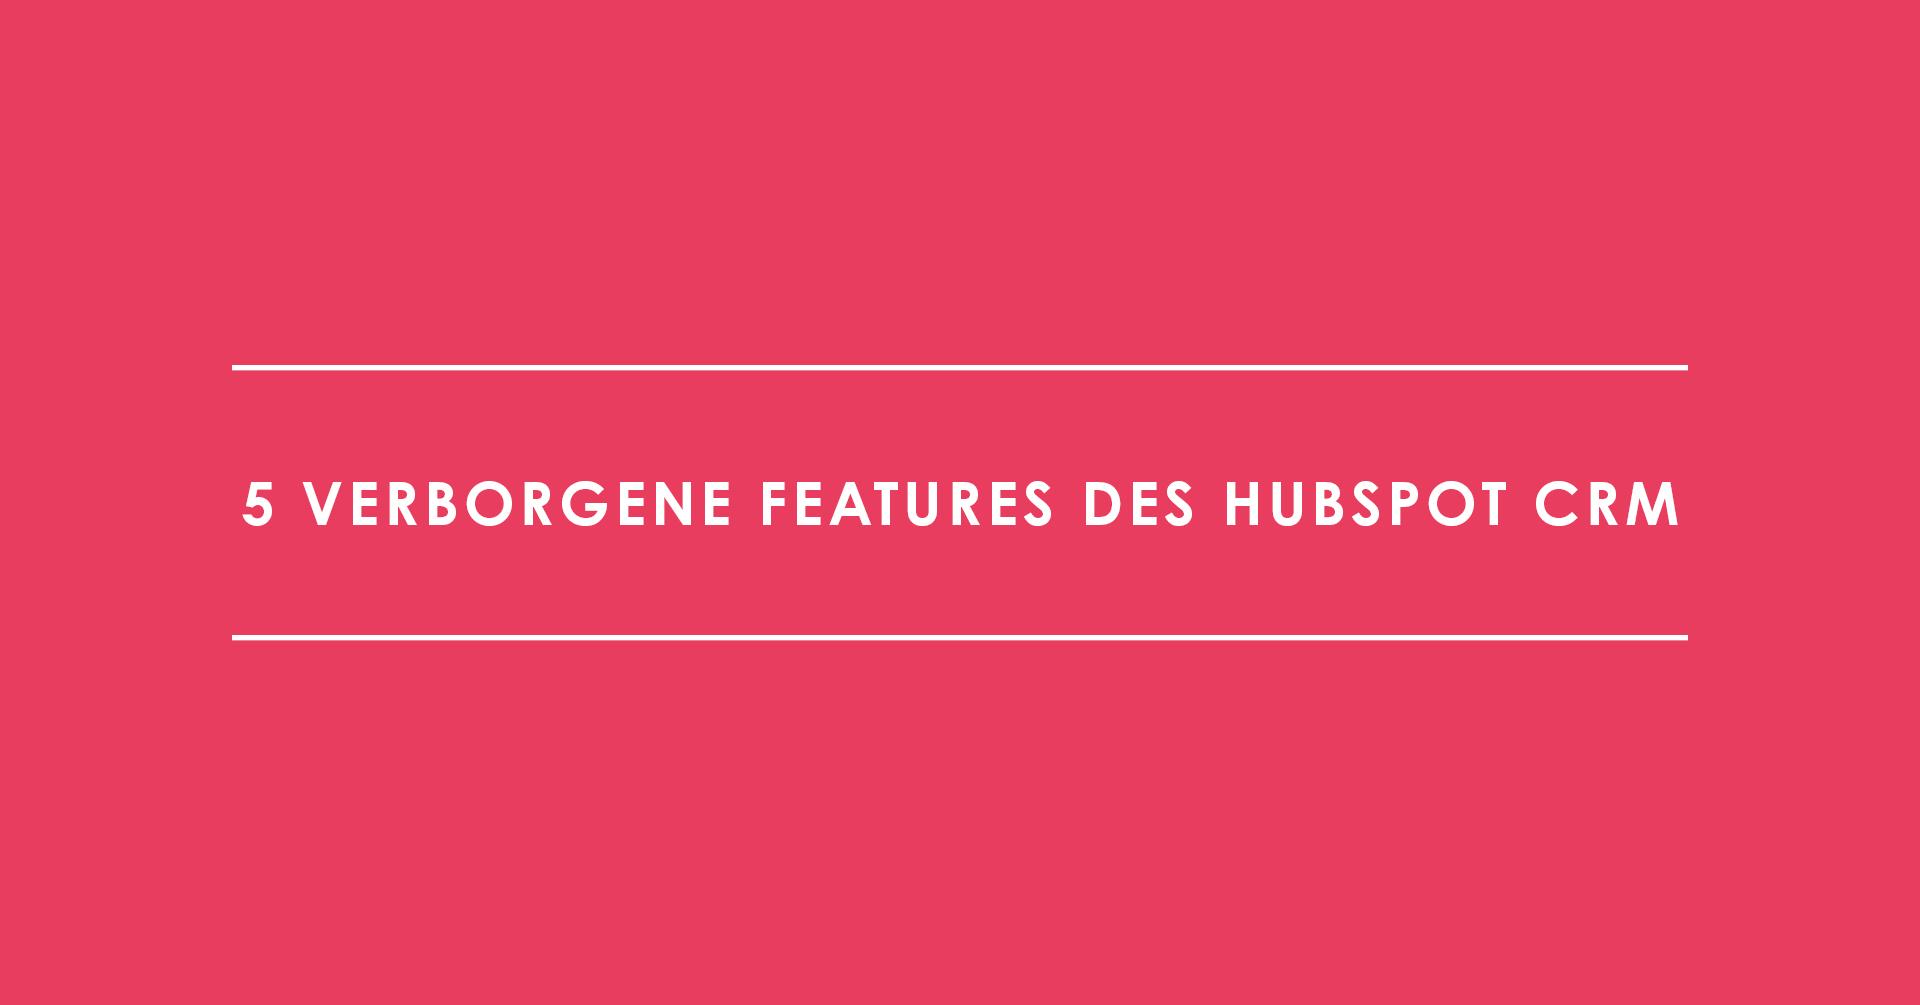 5 verborgene Features des HubSpot CRM